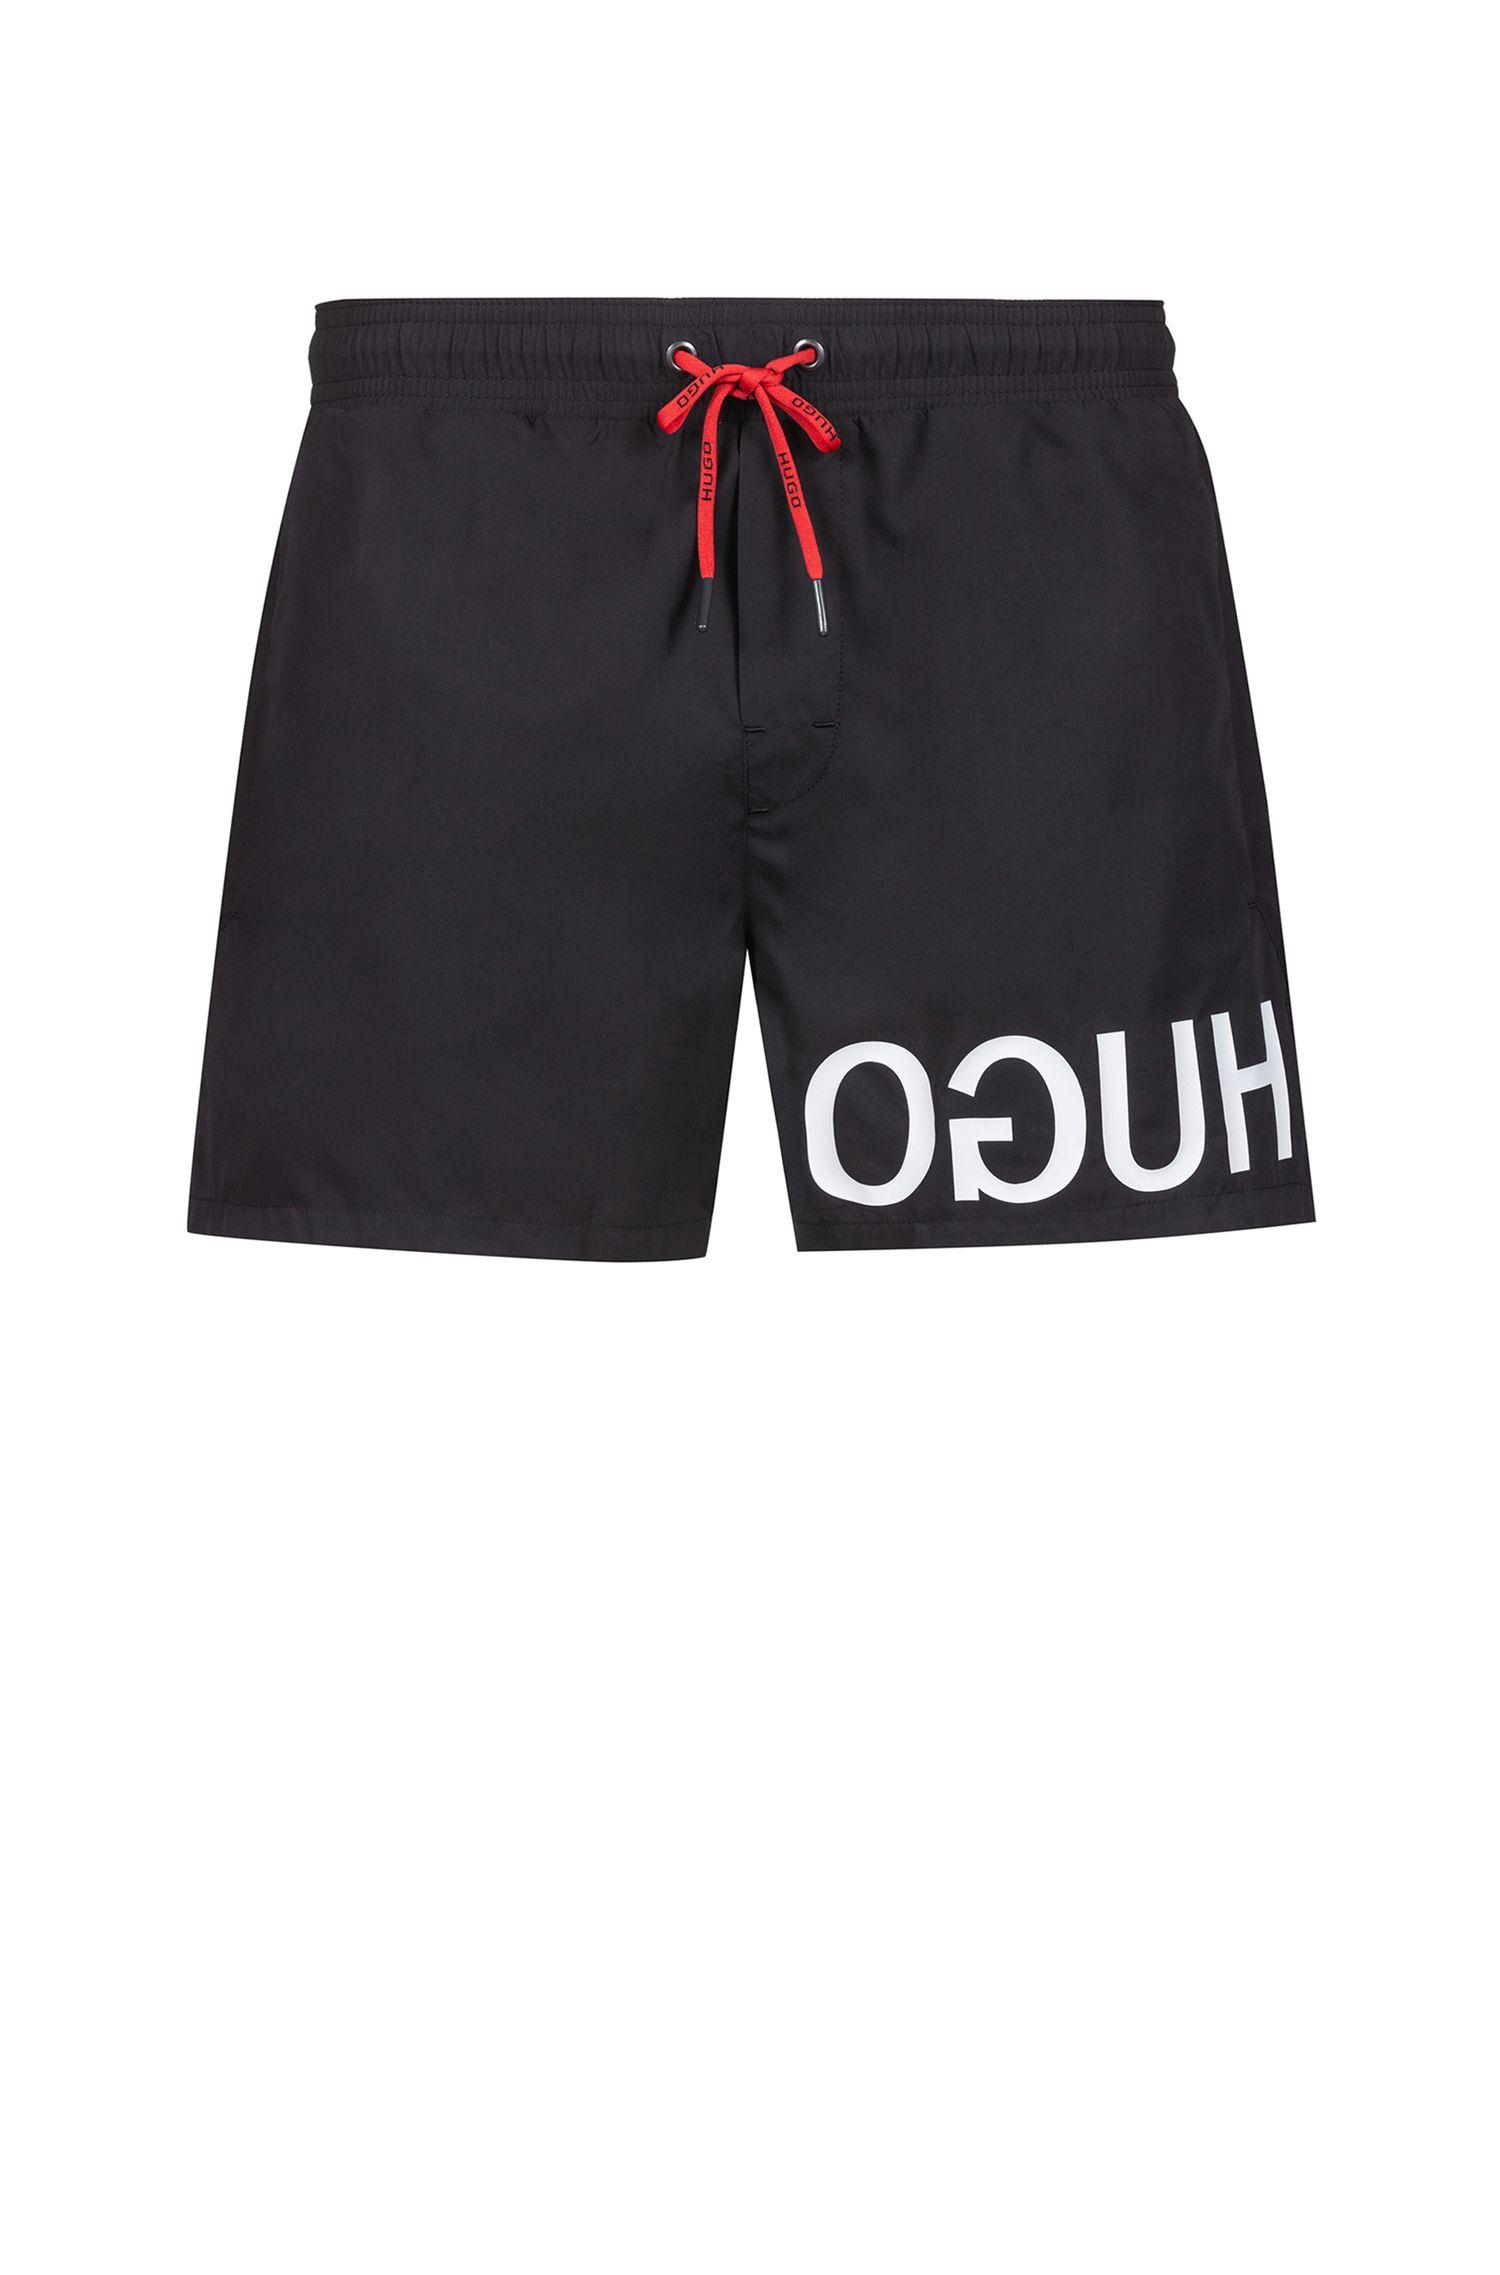 Bañador tipo shorts de secado rápido con logo invertido estampado, Negro